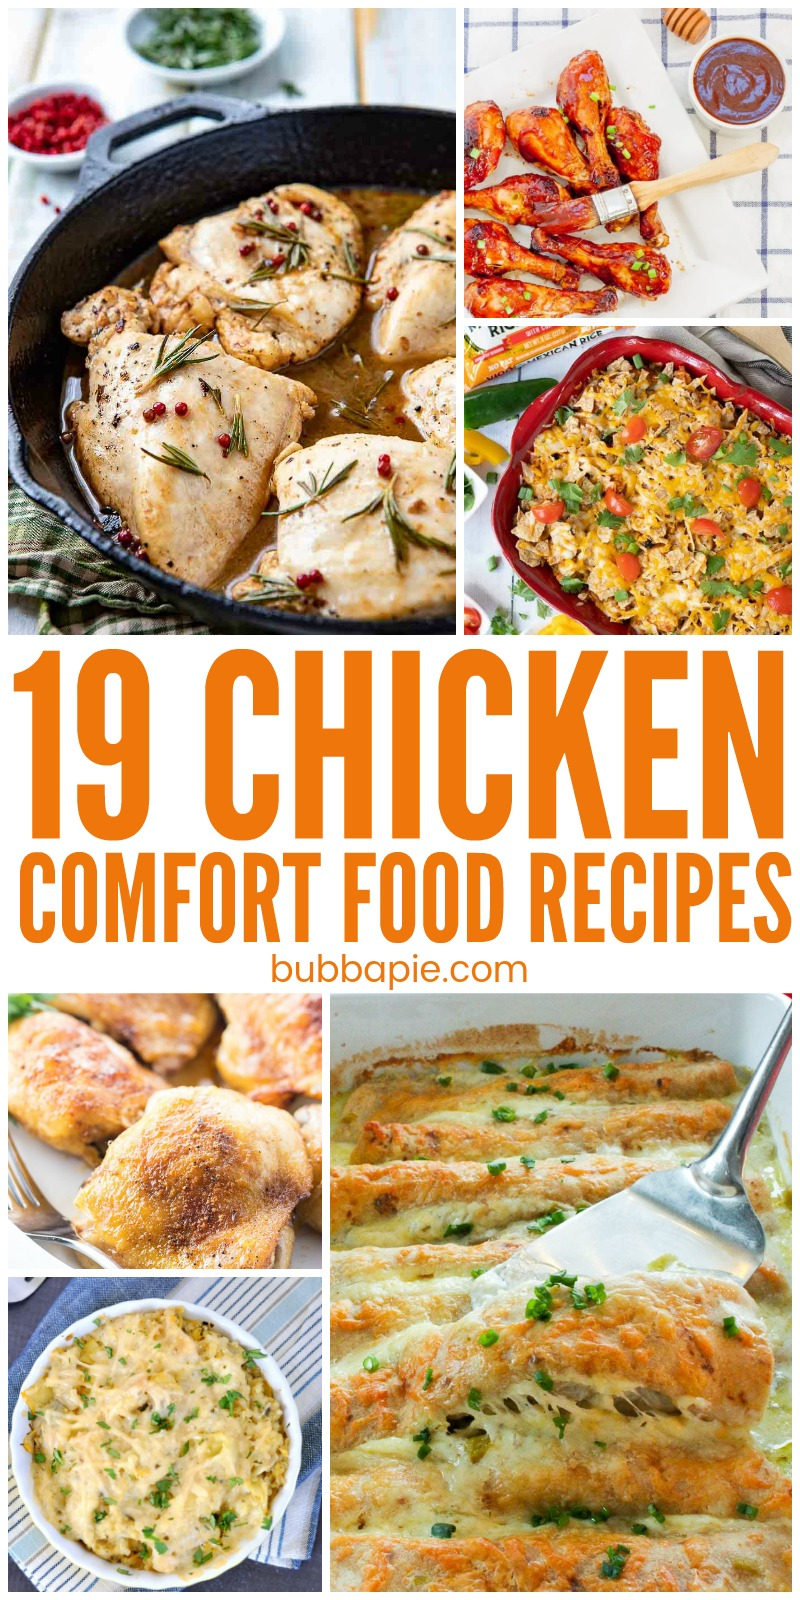 19 Chicken Comfort Food Recipes